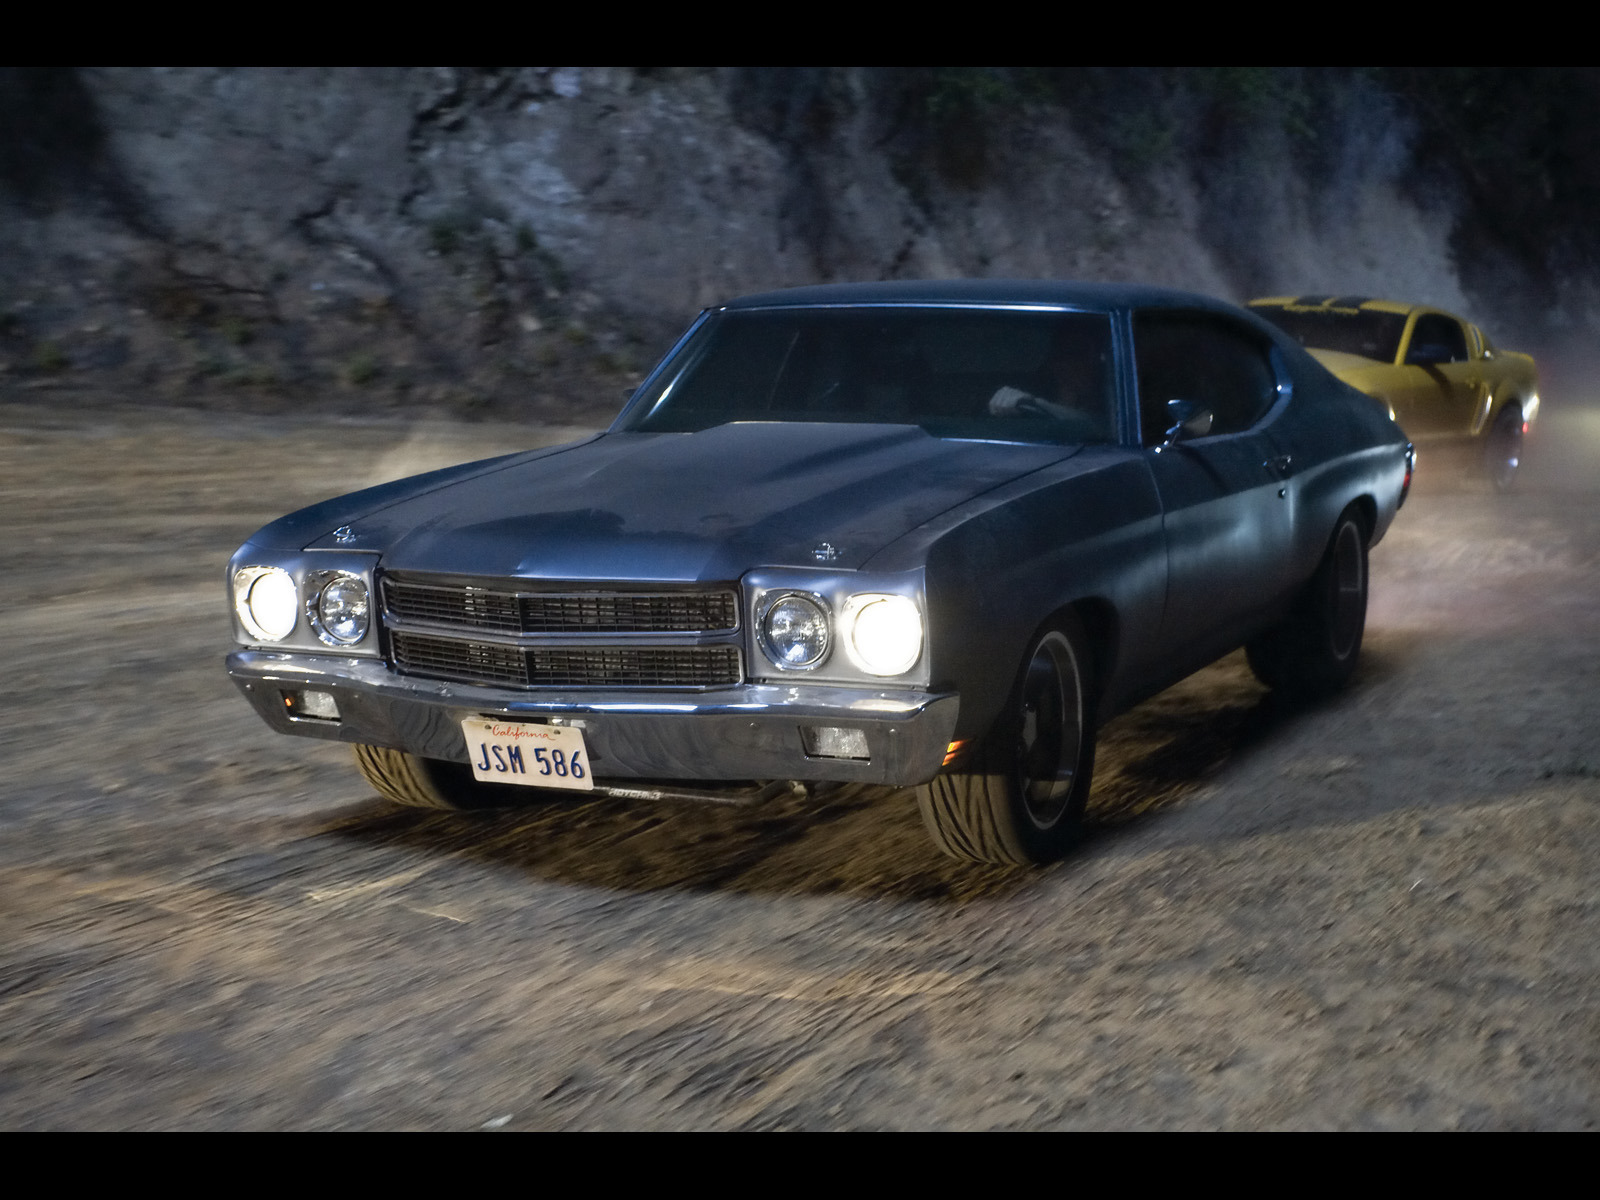 Fast Furious Movie Cars   Chevelle   1600x1200   Wallpaper 1600x1200